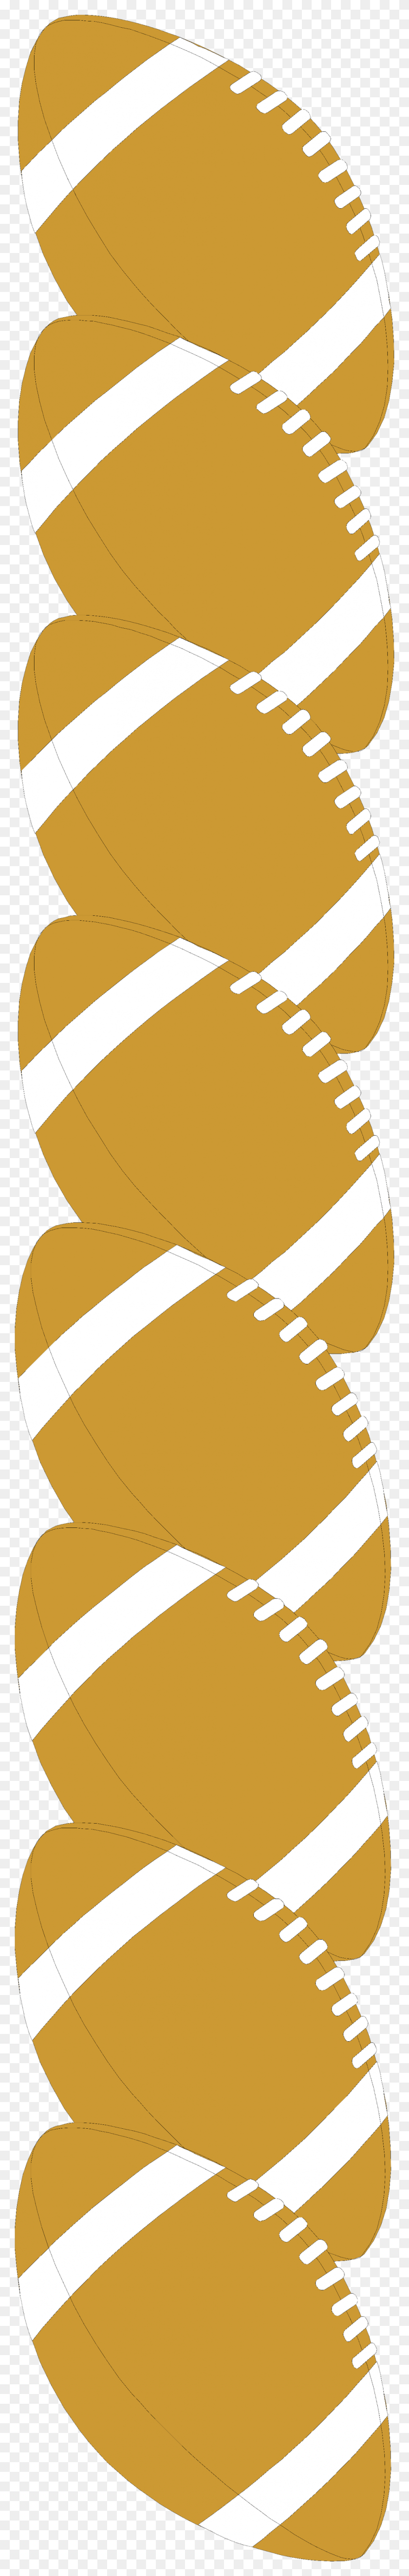 Football Clipart Border - Microsoft Clip Art Borders